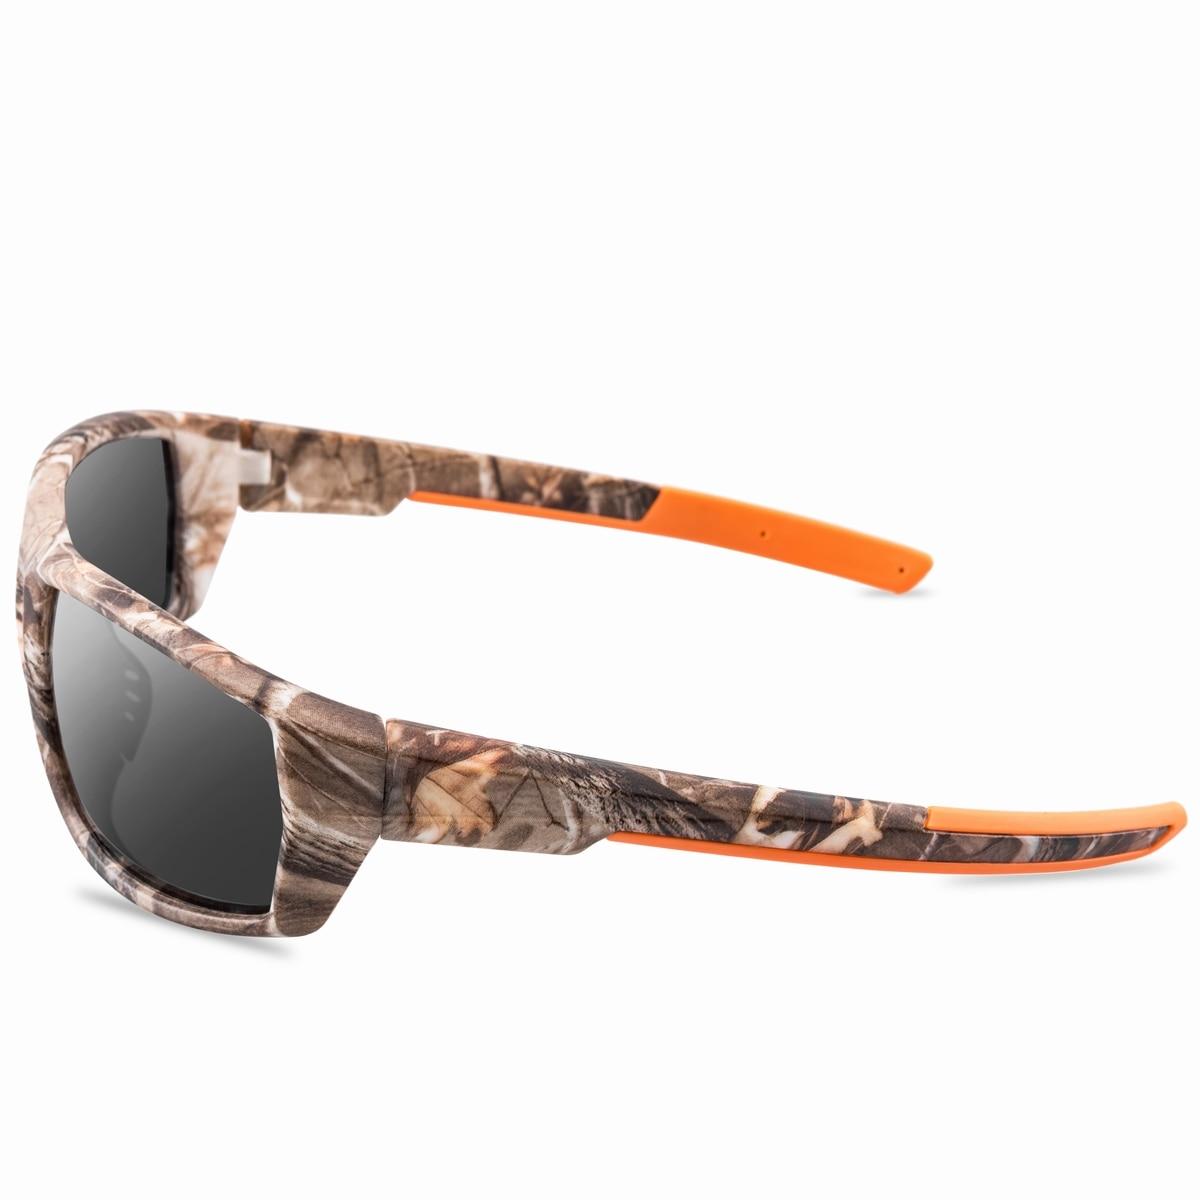 New Camouflage Sport Fishing glasses Rayed Sun glasses Goggles Outdoor Polarized Sunglasses Men Women Fish Eyewear